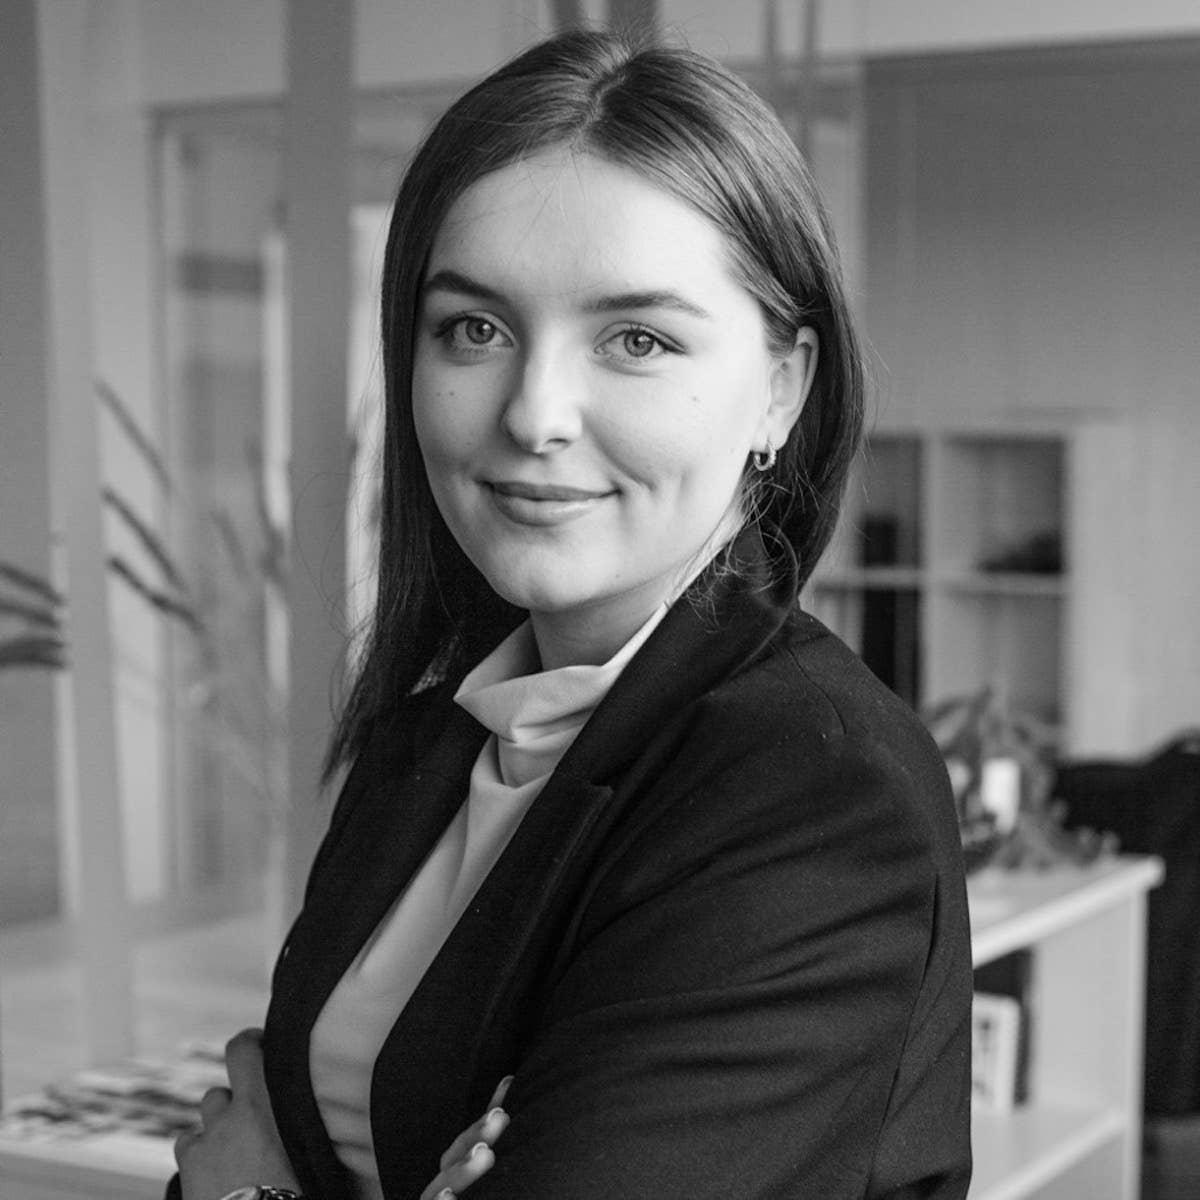 Karolina Matkevičiūtė